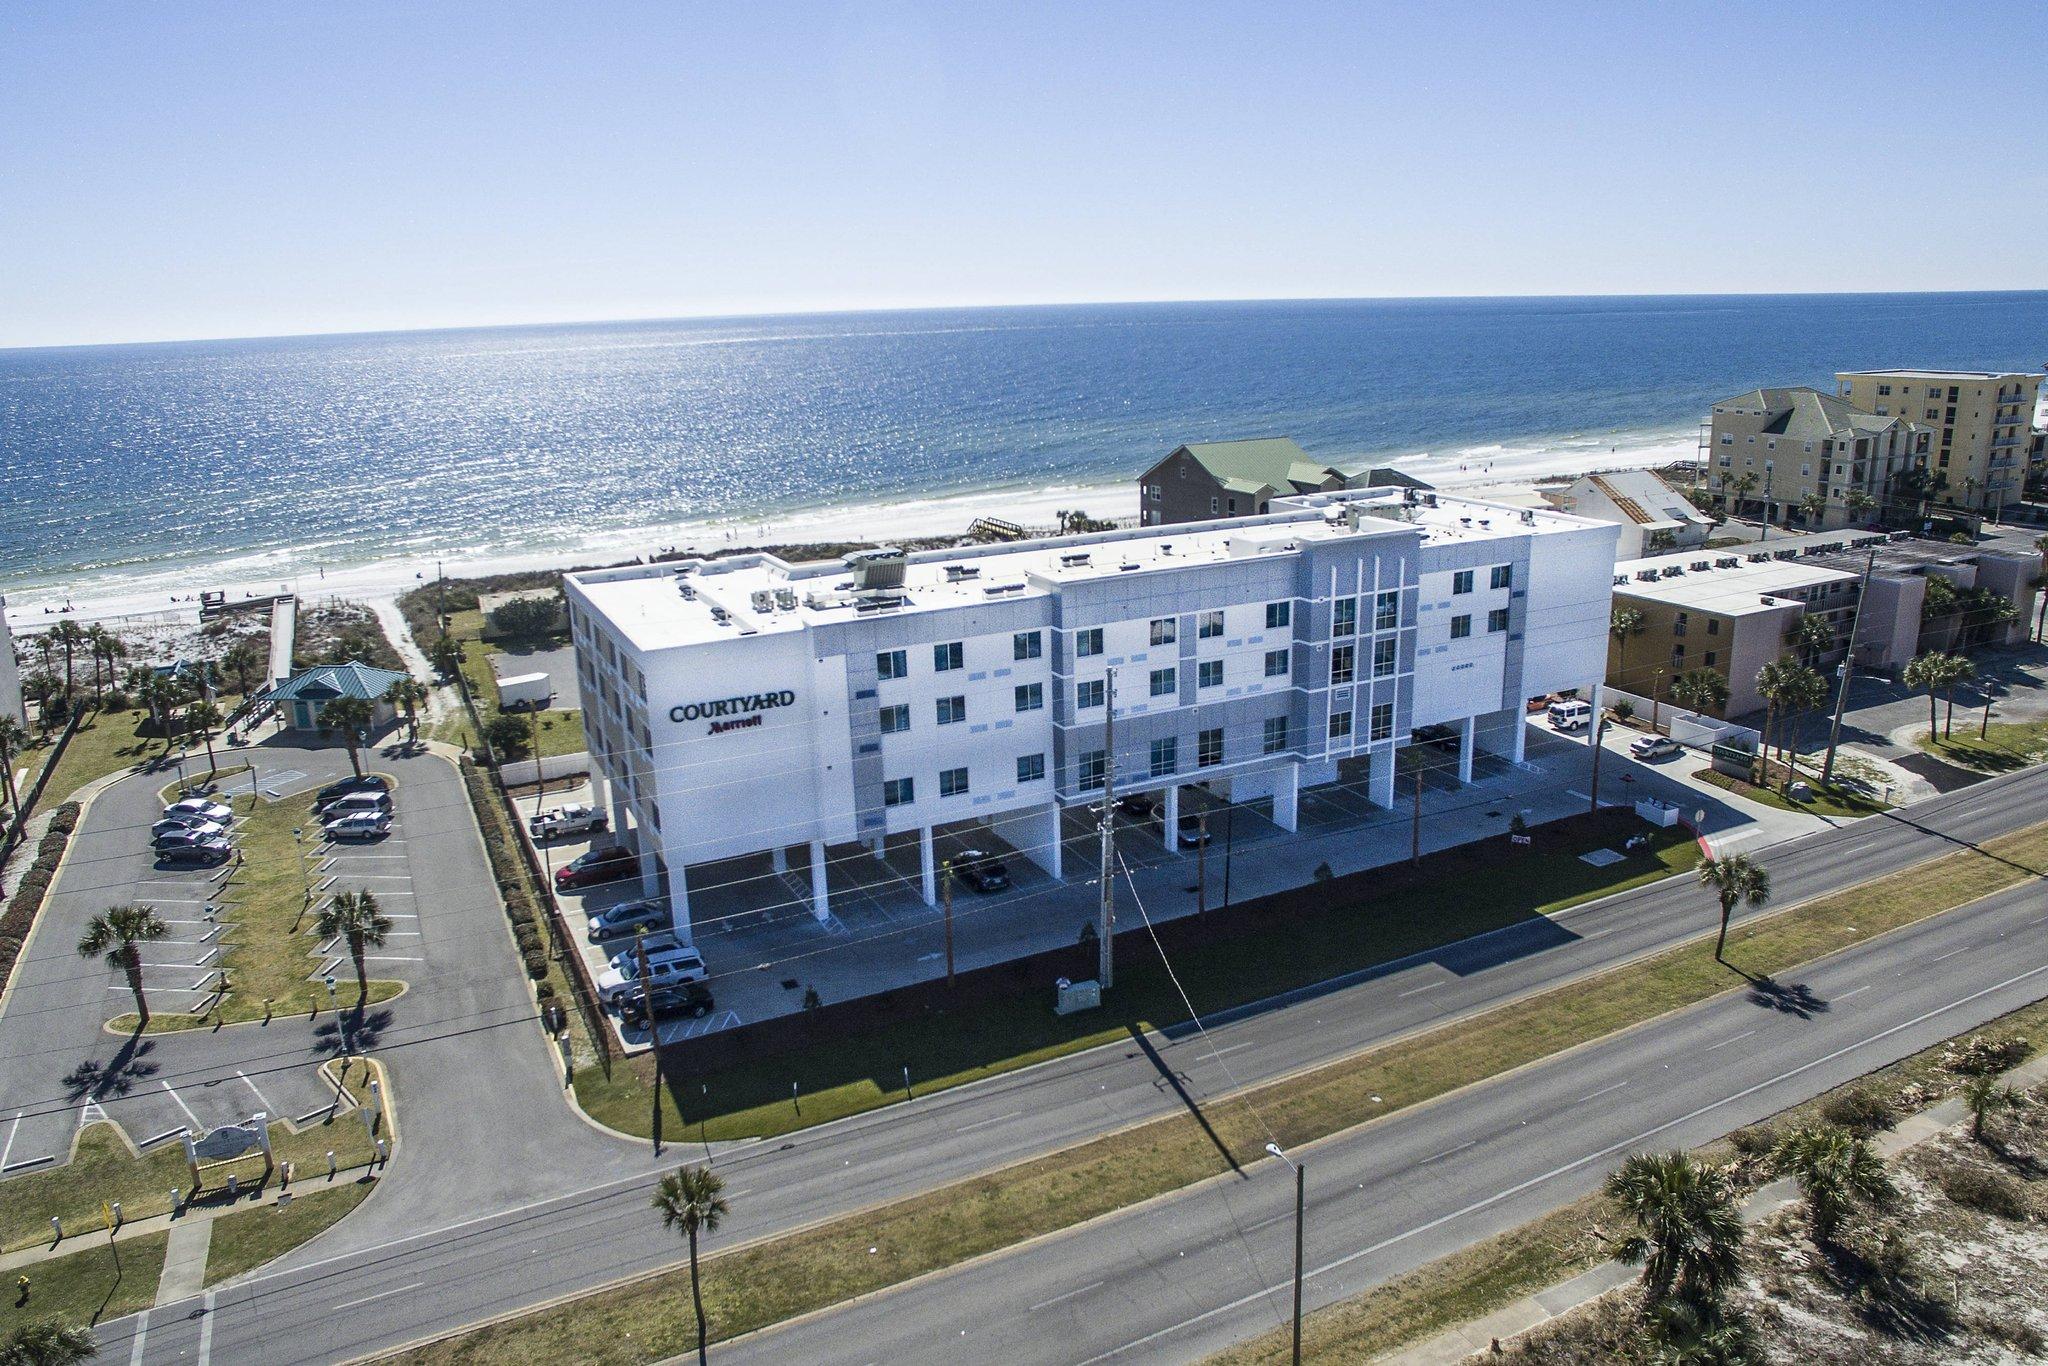 Courtyard Fort Walton Beach-West Destin